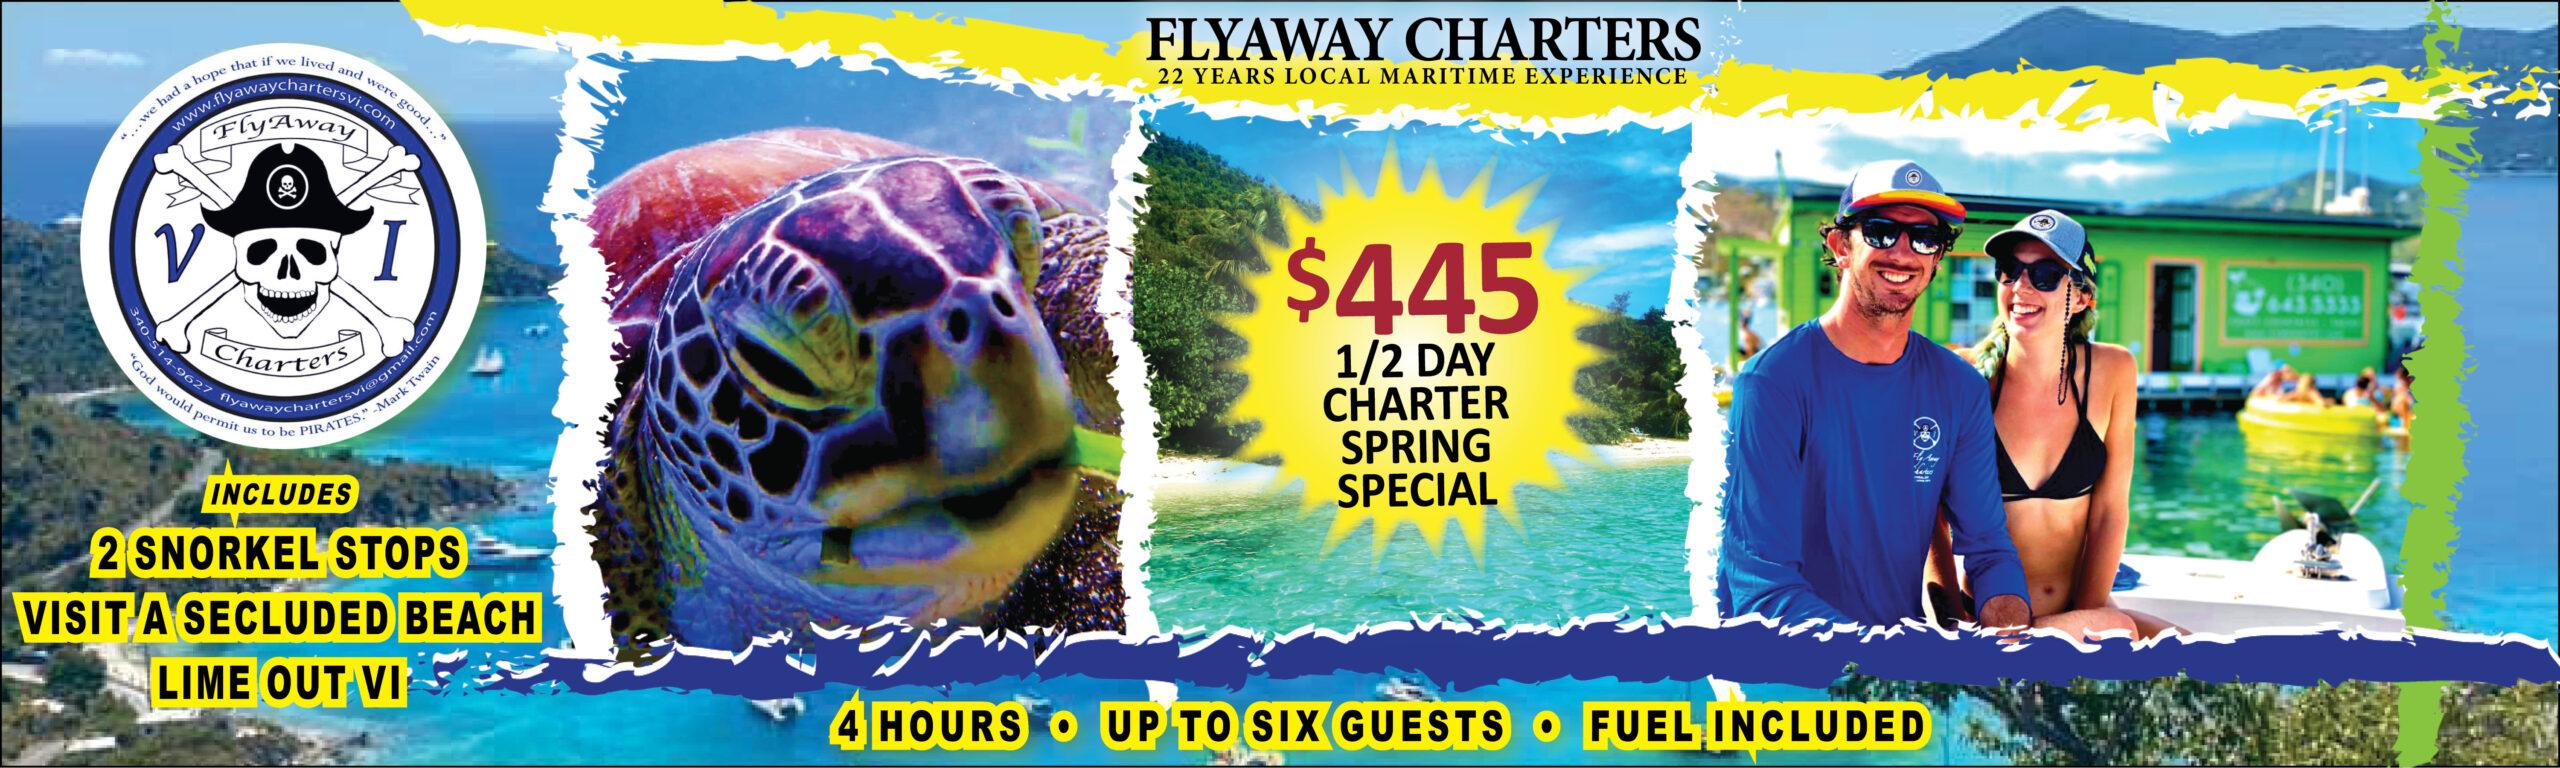 Flyaway Charters -- Saint John Boat Charters Ad